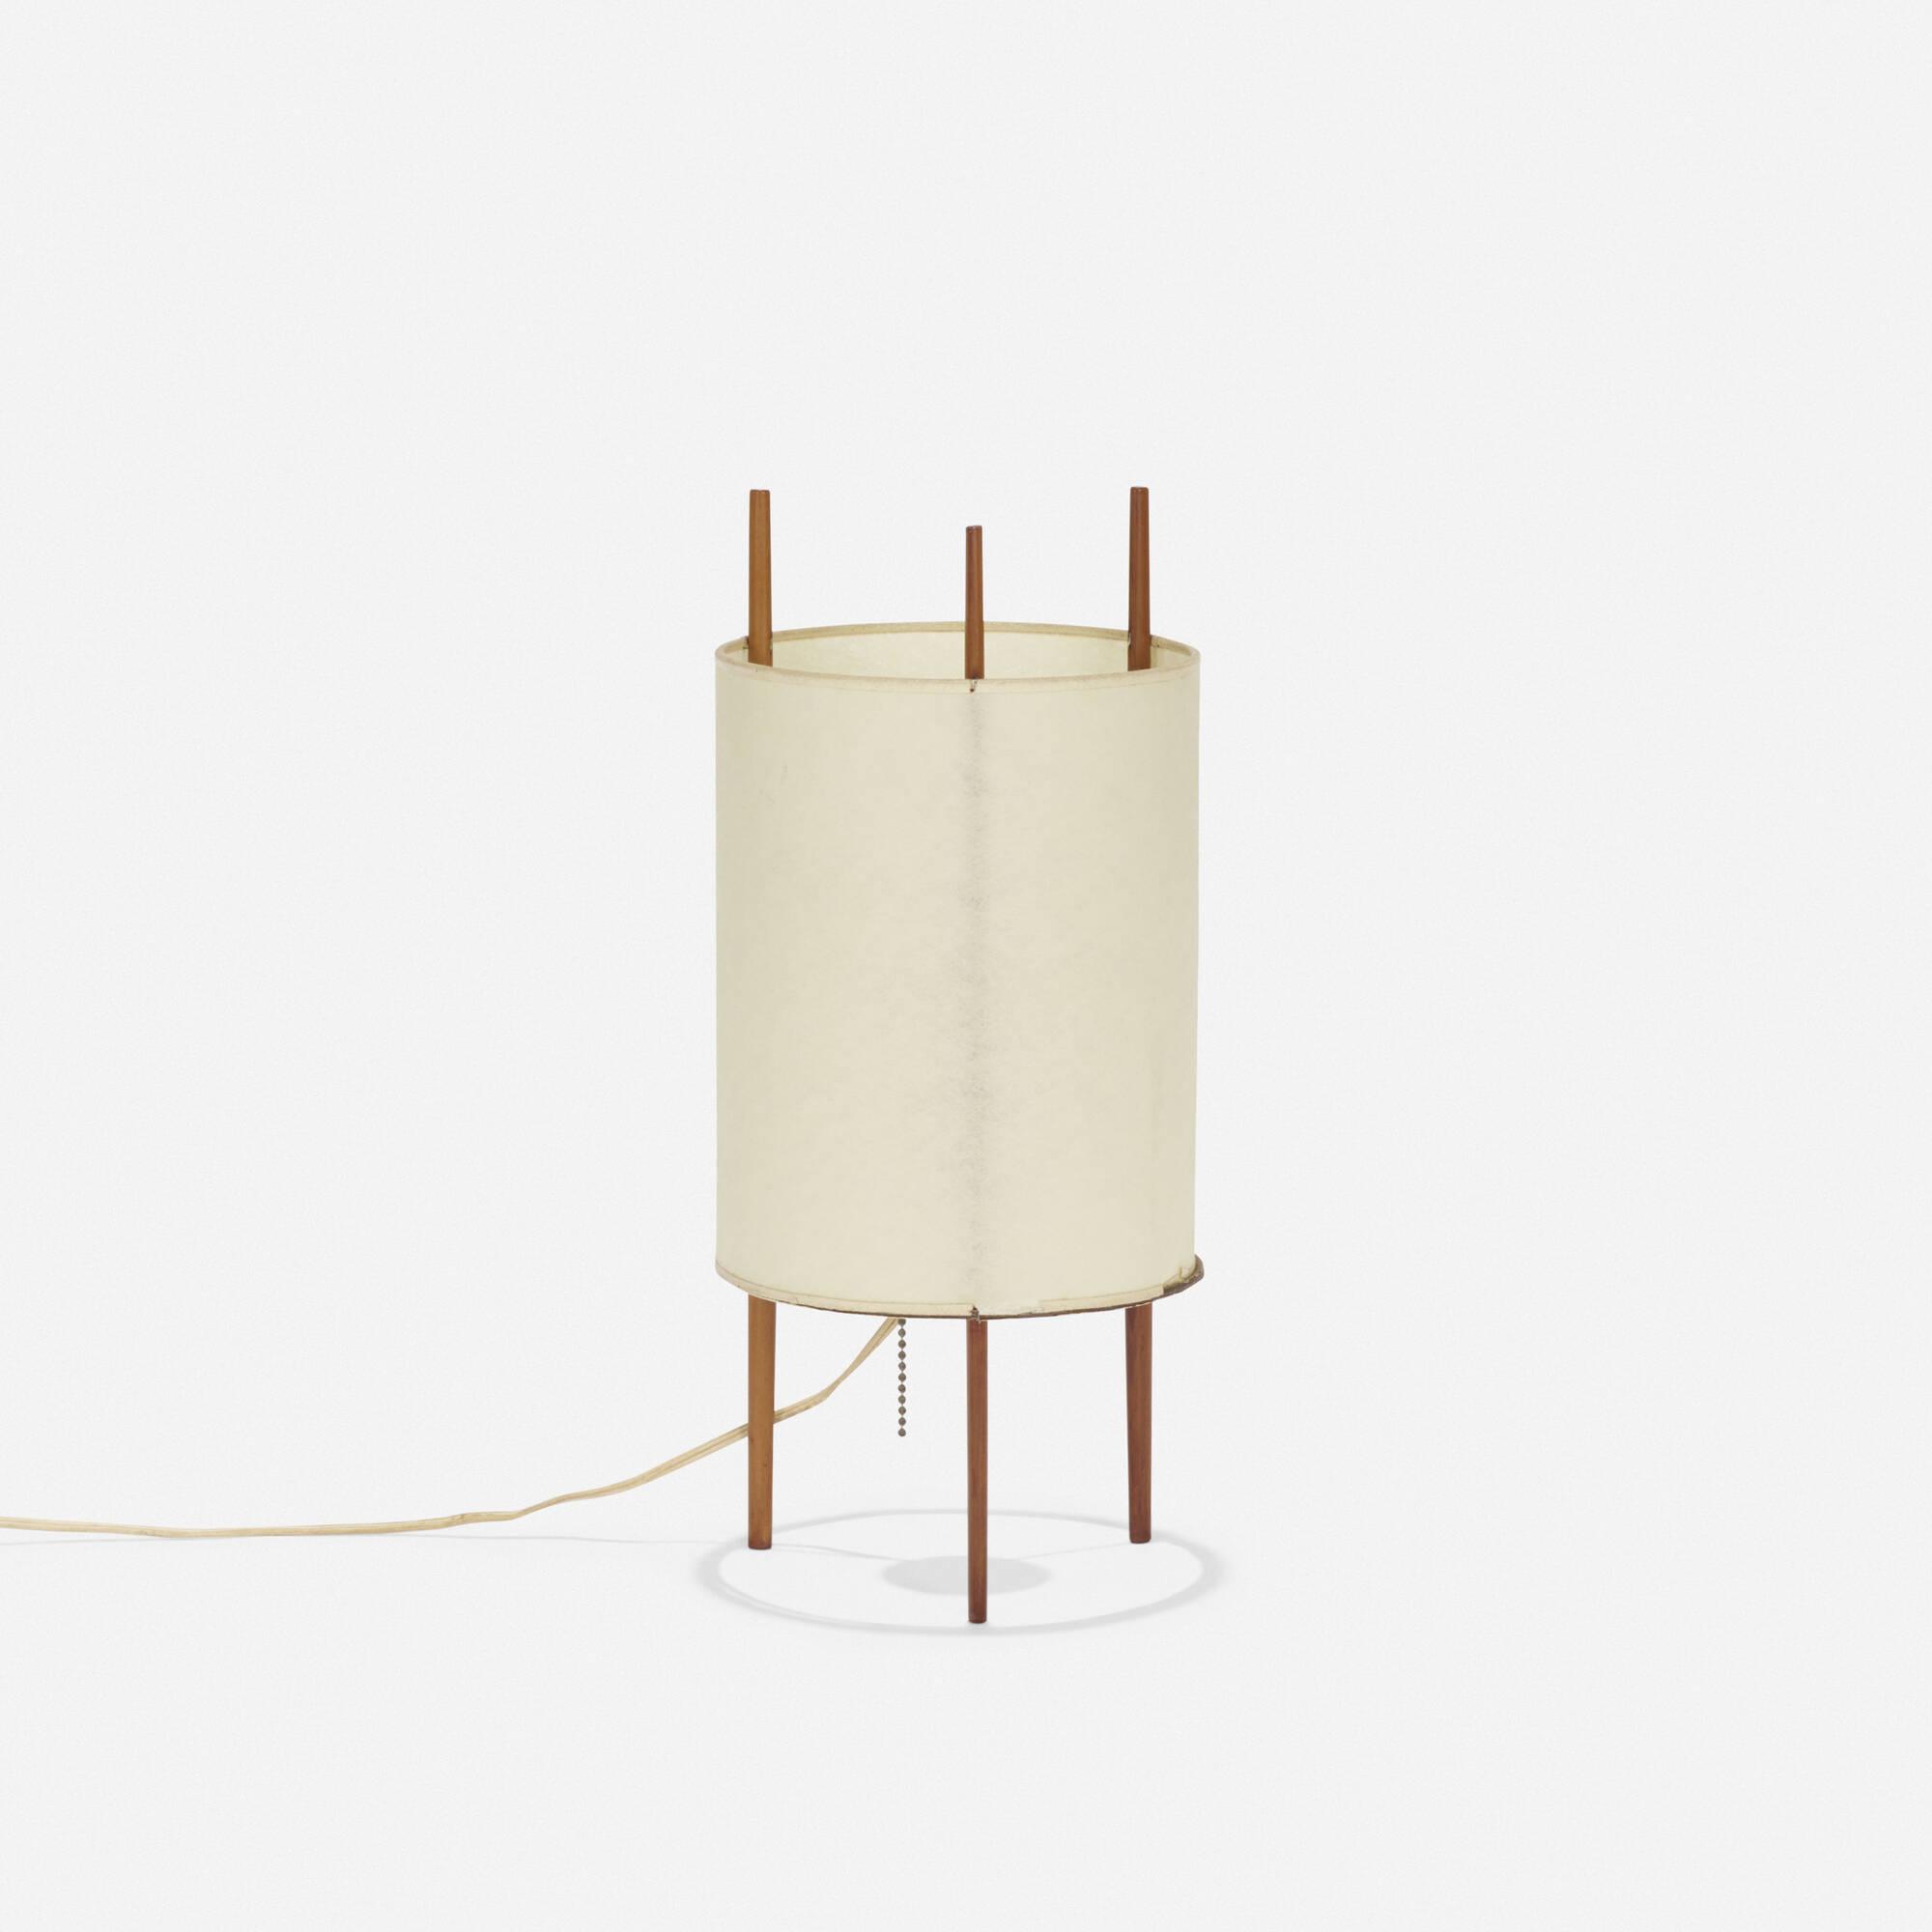 isamu noguchi lighting. 104: Isamu Noguchi / Table Lamp, Model 9 (1 Of 2) Lighting